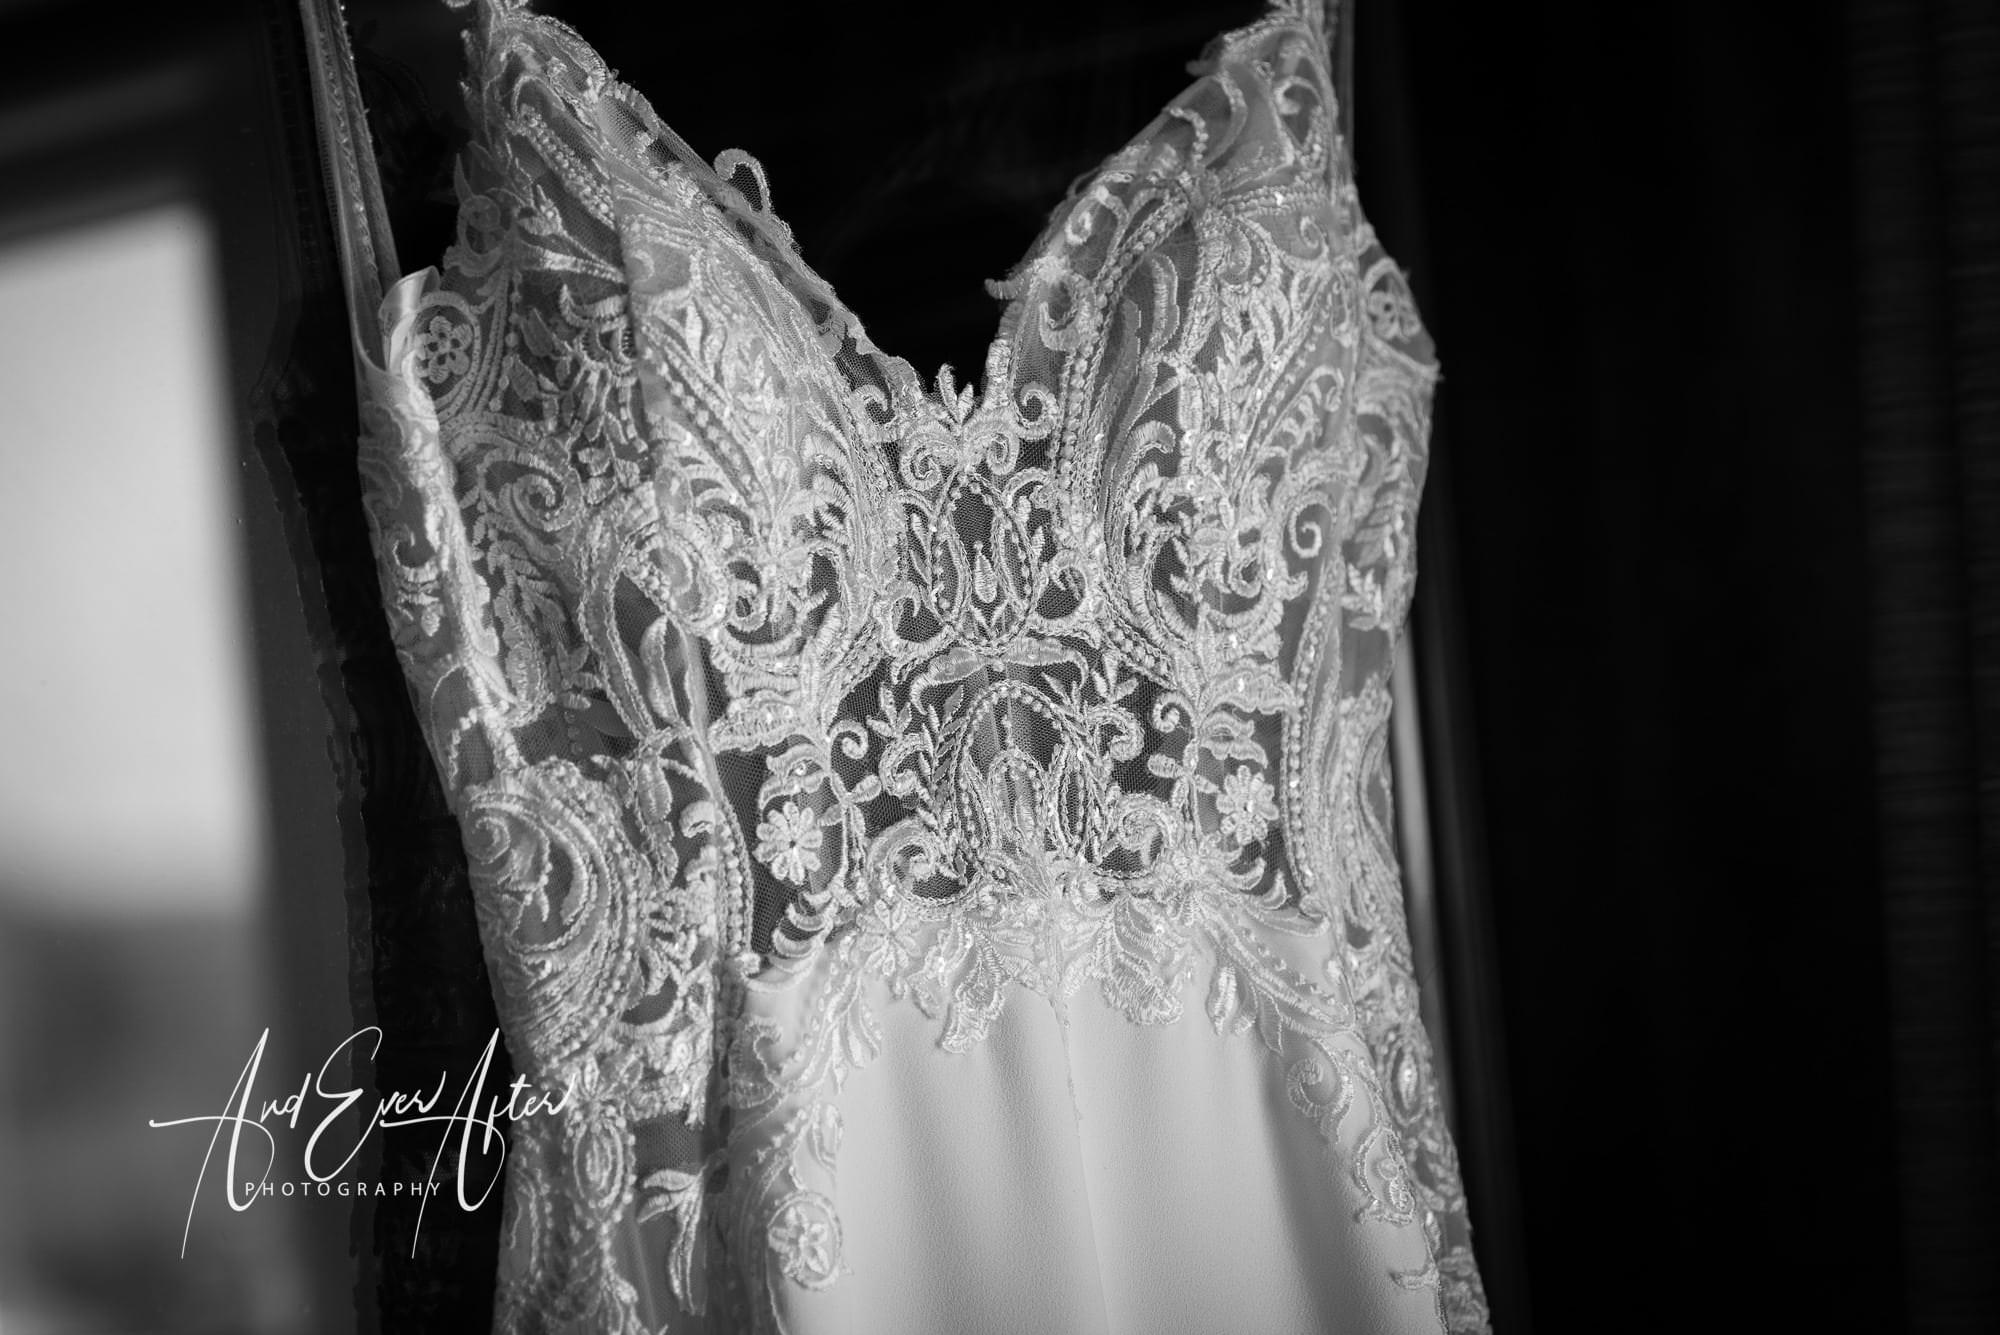 bride and groom, wedding dress,